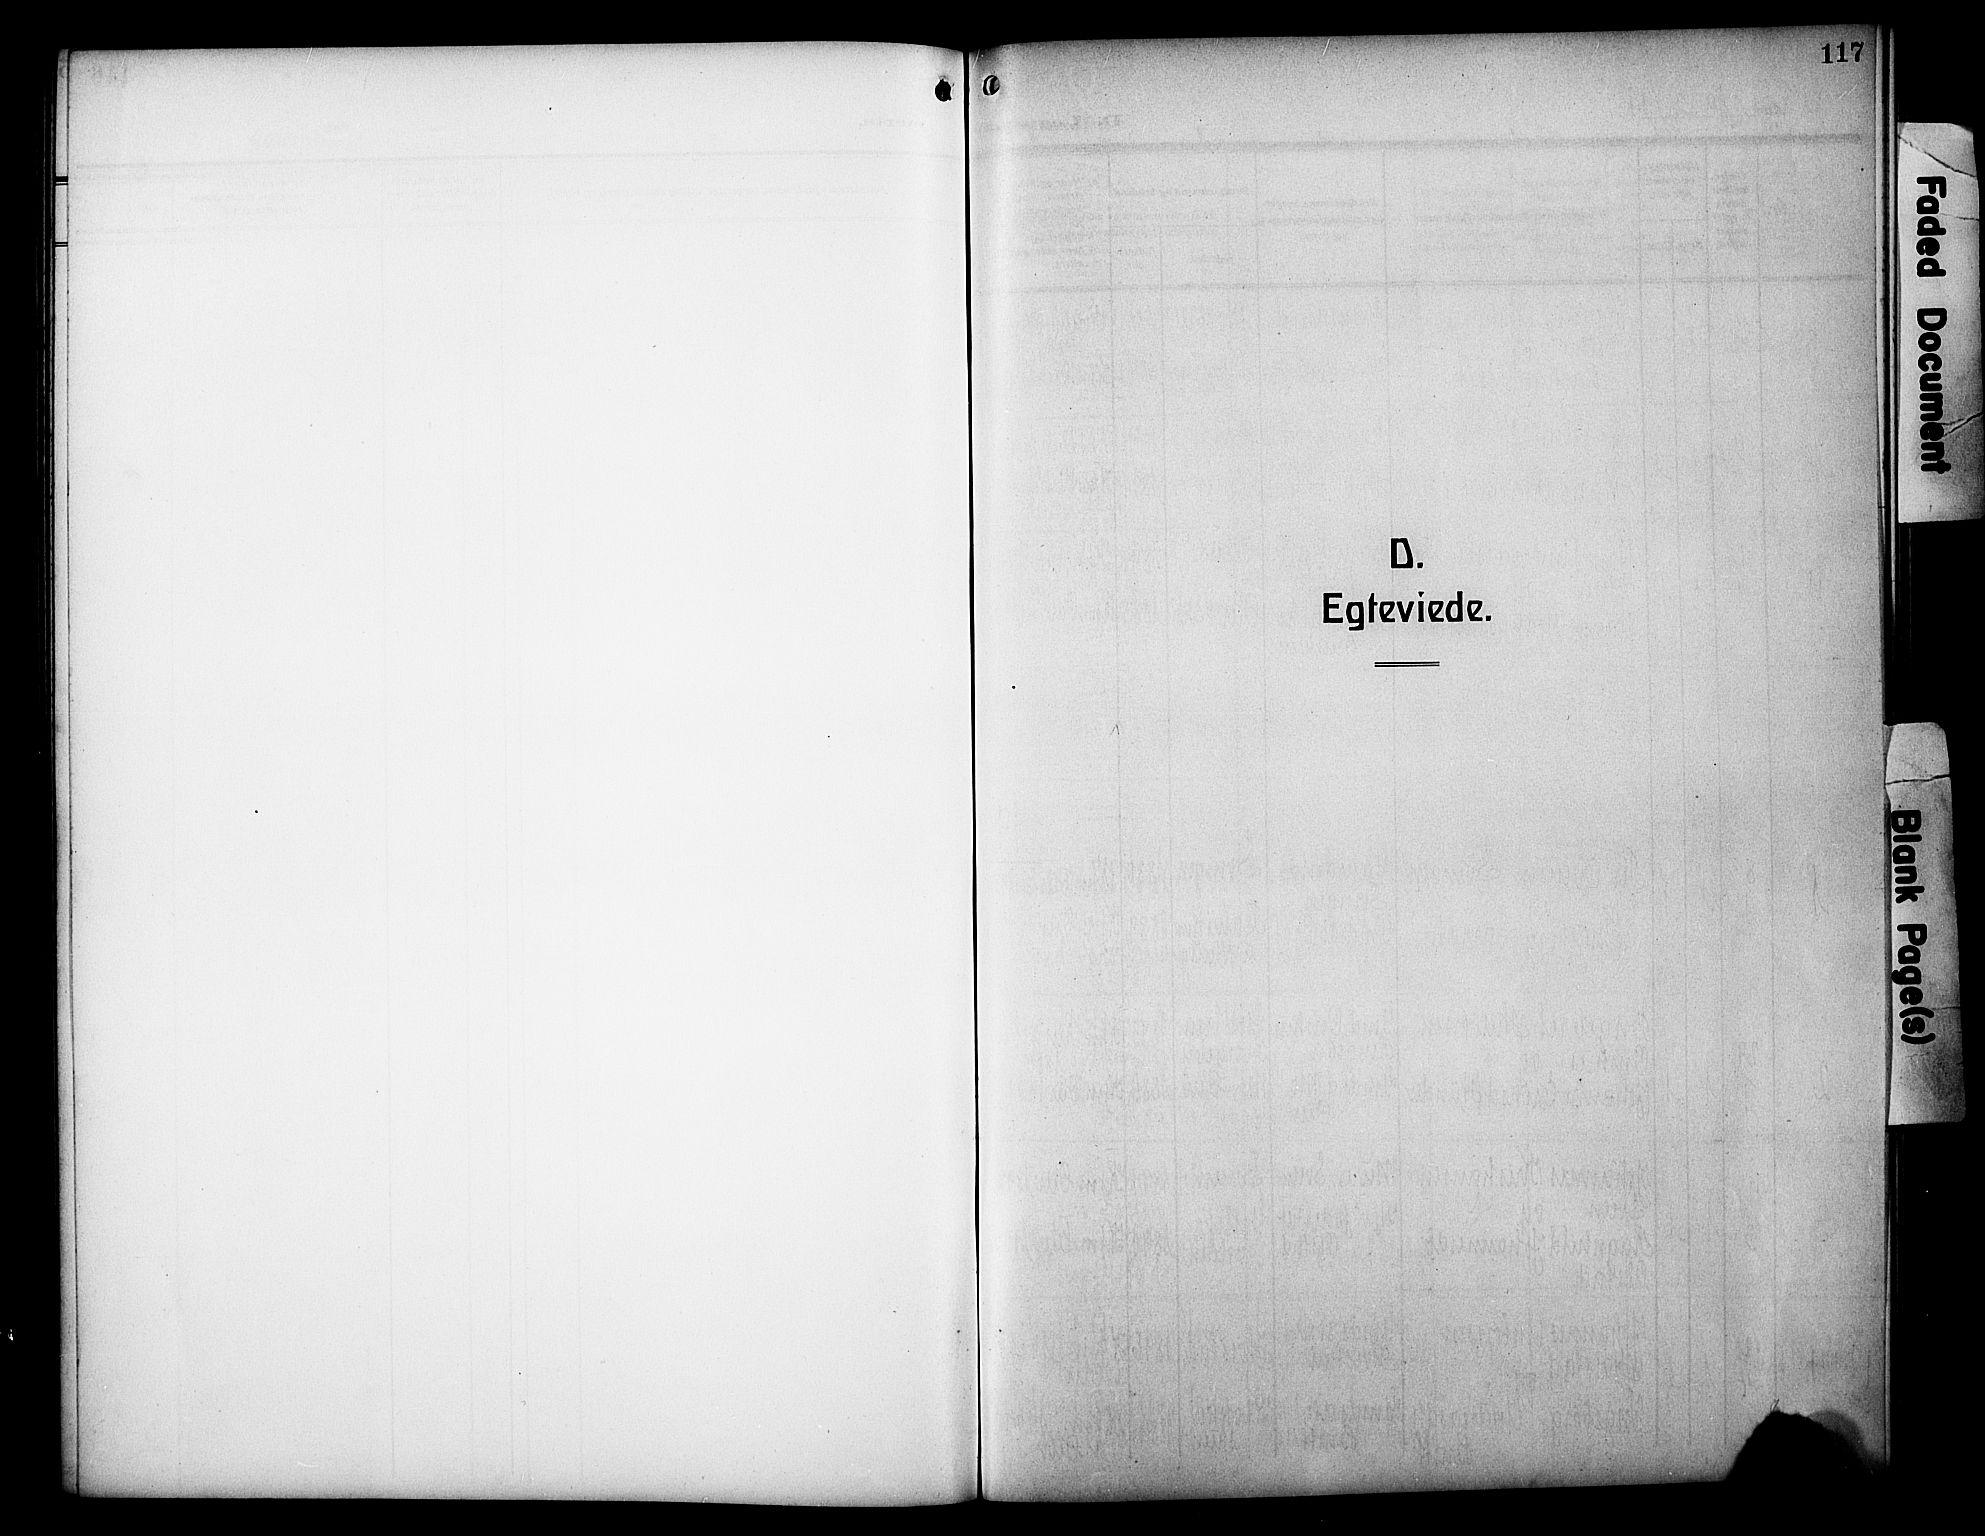 SAH, Øyer prestekontor, Klokkerbok nr. 7, 1913-1928, s. 117